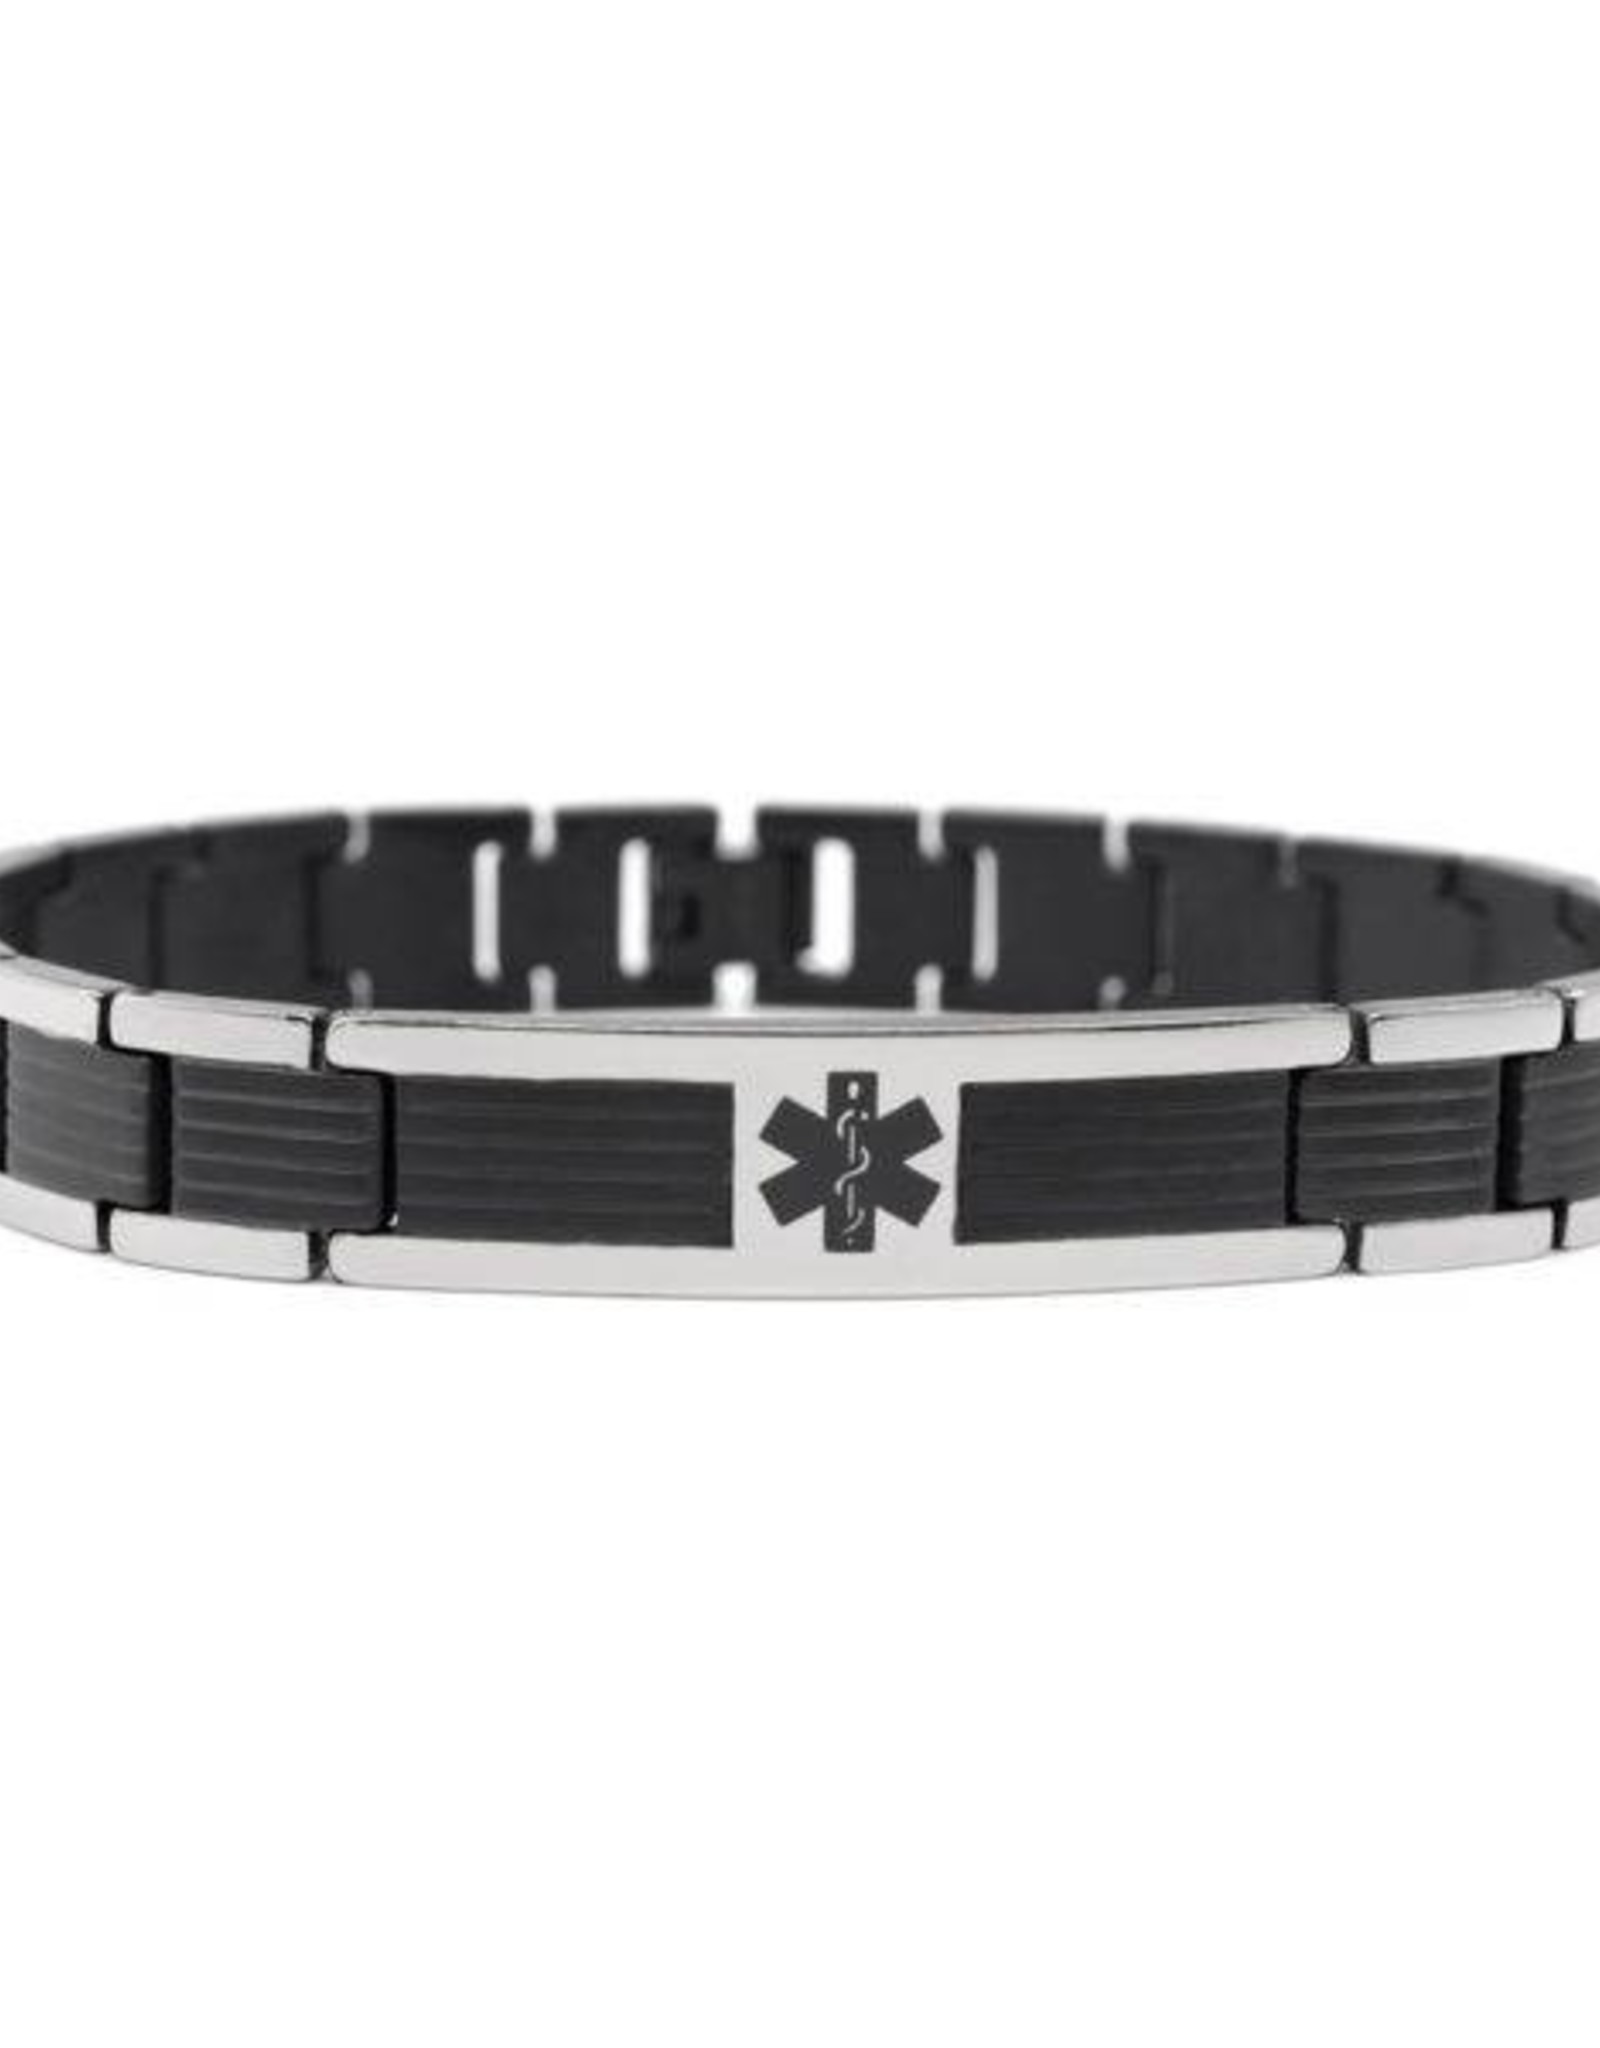 Titanium Armband